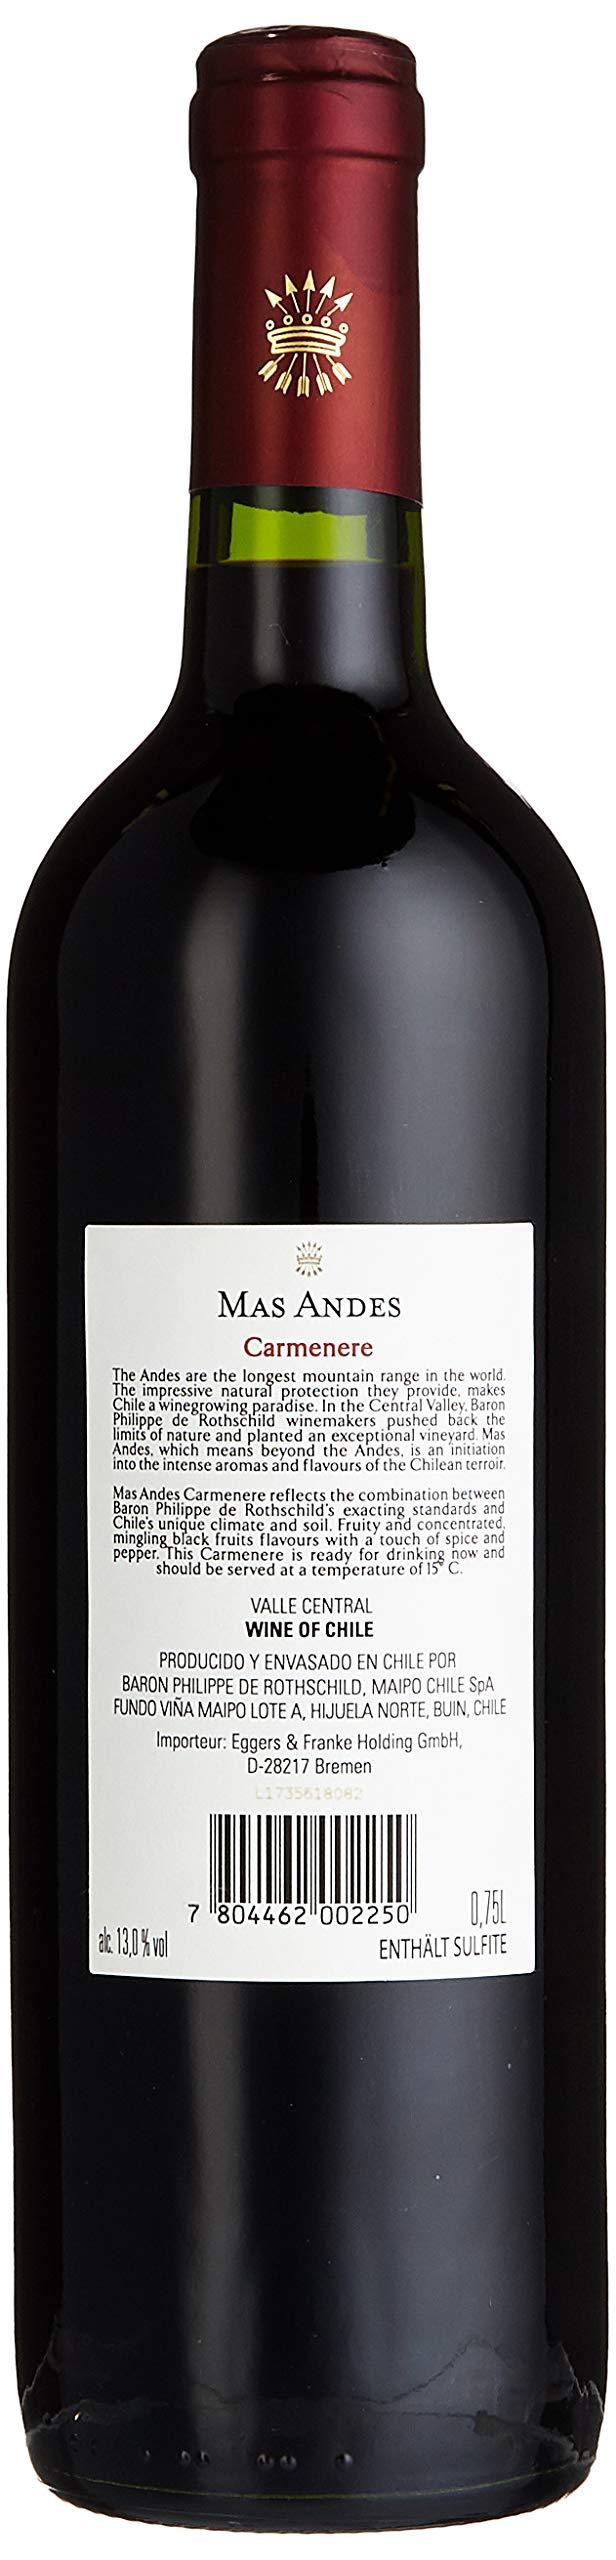 Mas-Andes-Carmenere-Chile-trocken-6-x-075-l